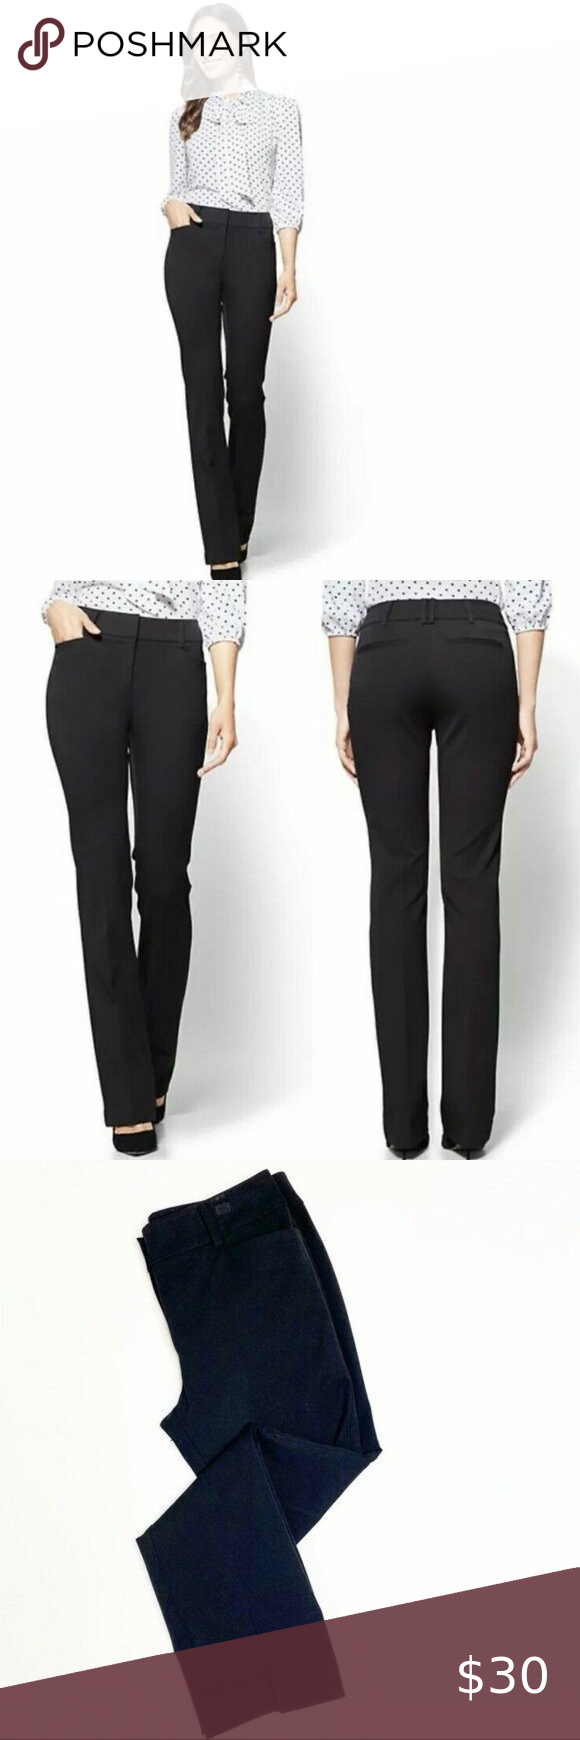 Olaizolav Black Pants Work Outfit Black Pants Work Work Outfit [ 1251 x 867 Pixel ]